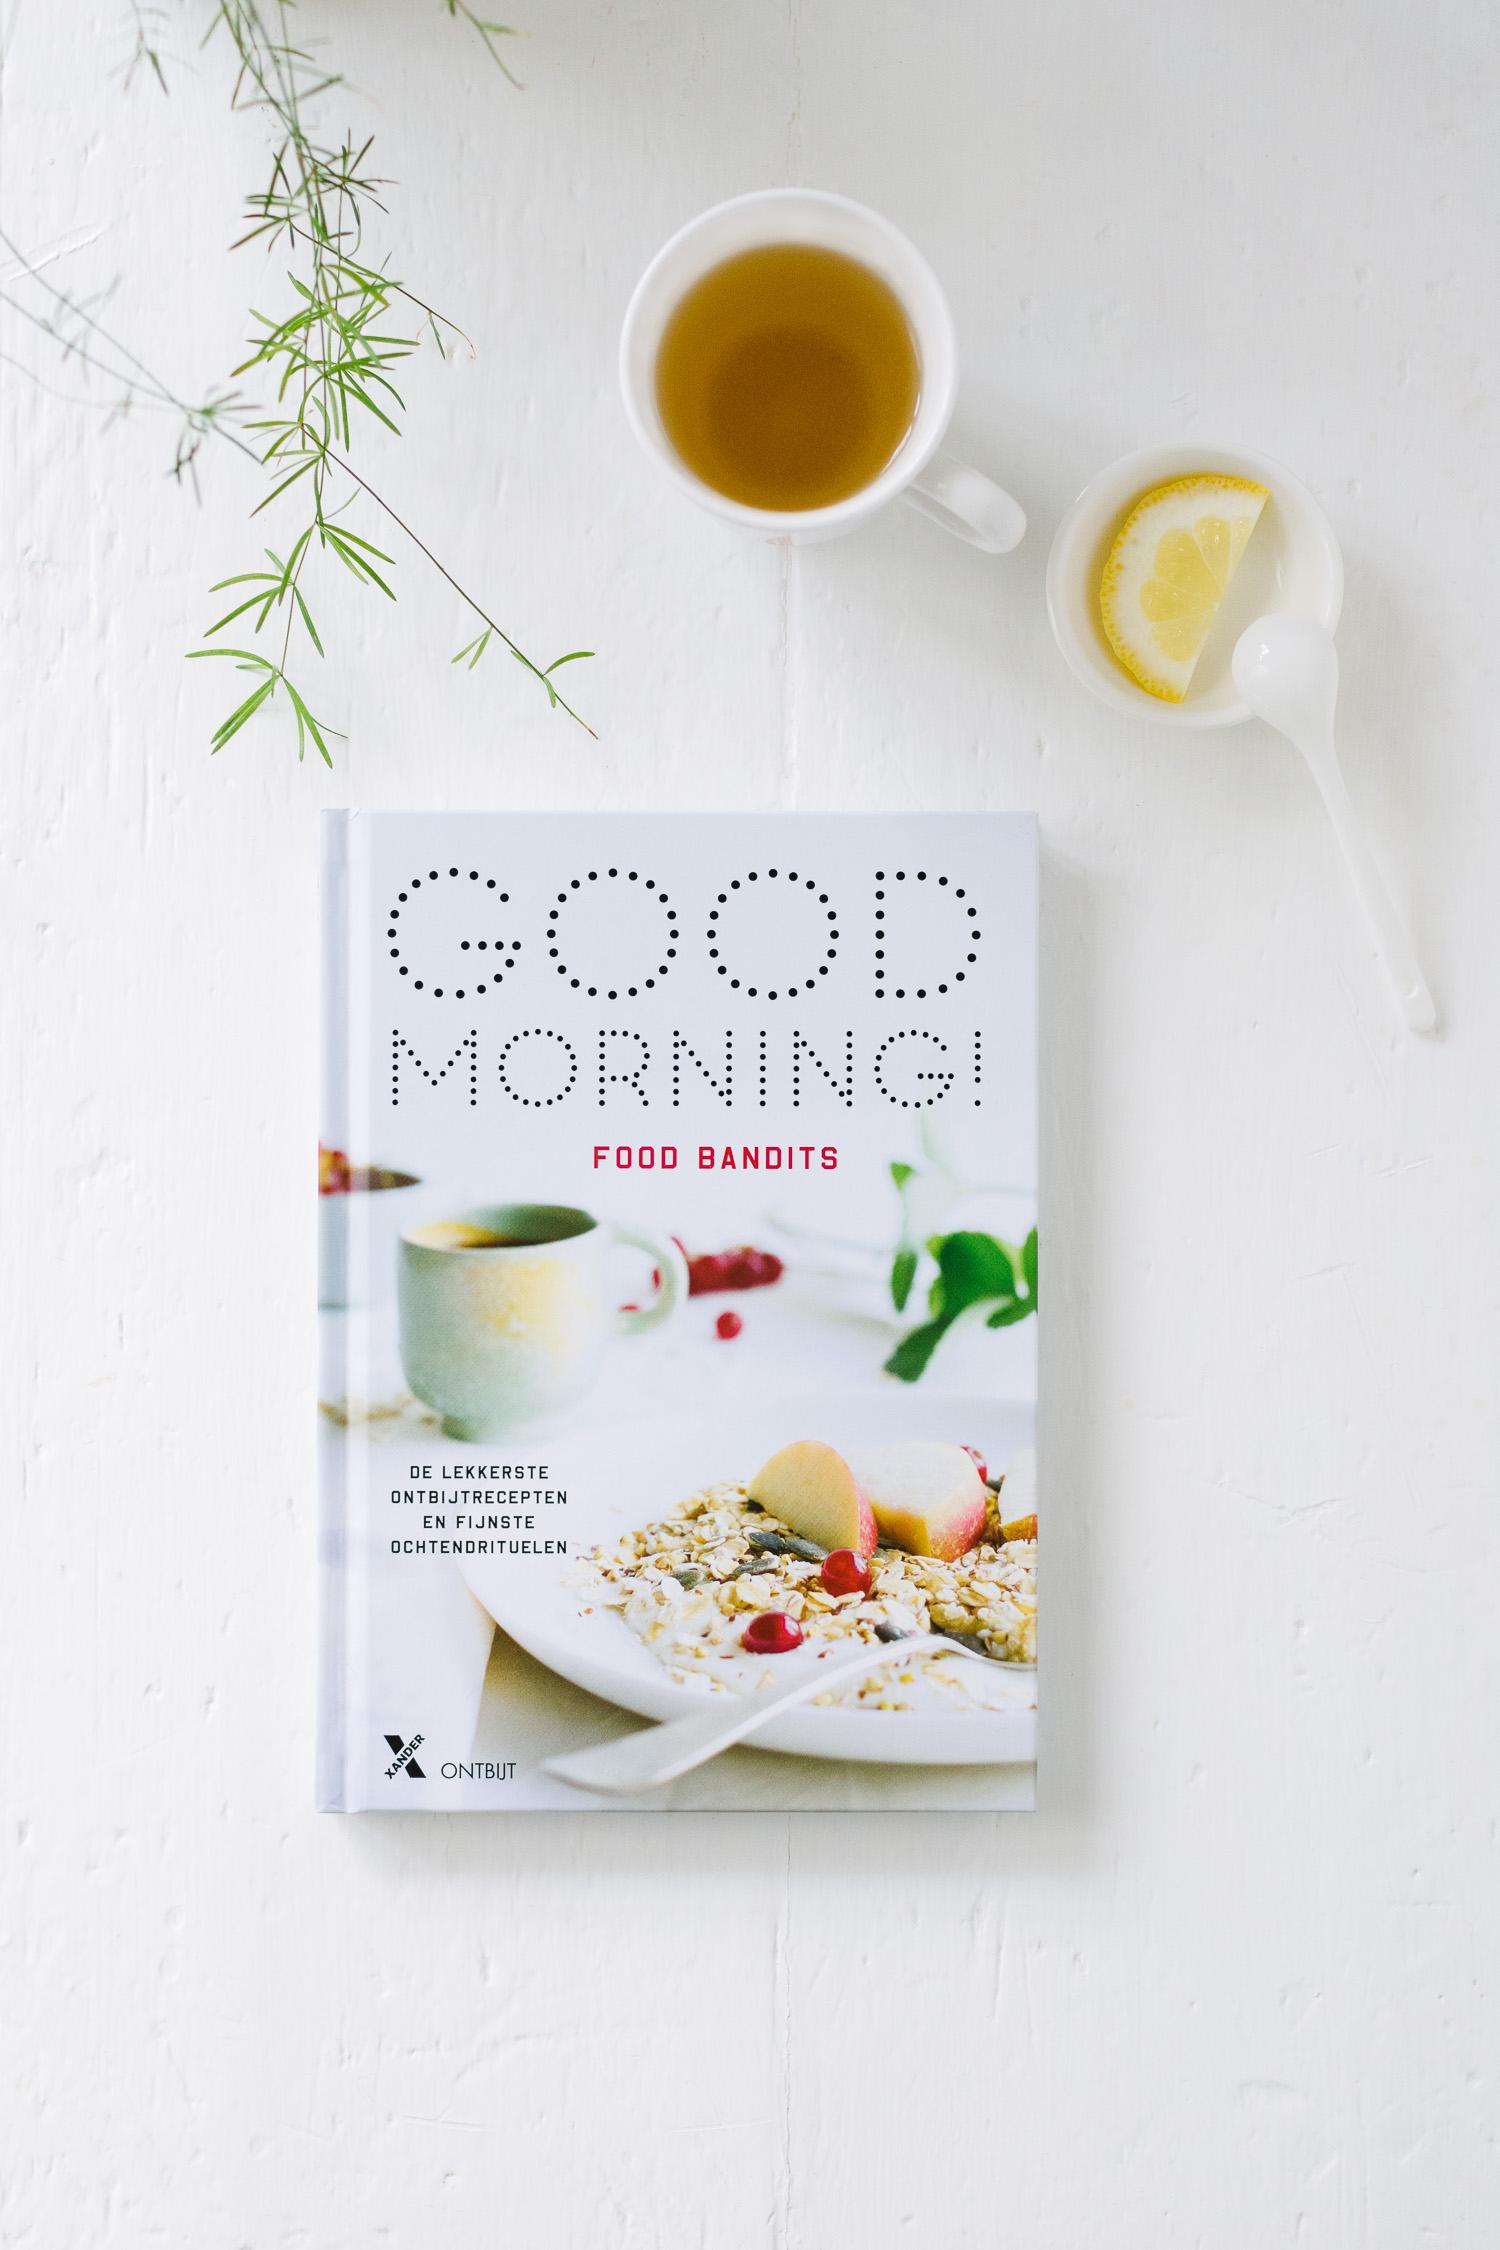 Food Bandits Good Morning - On a hazy morning